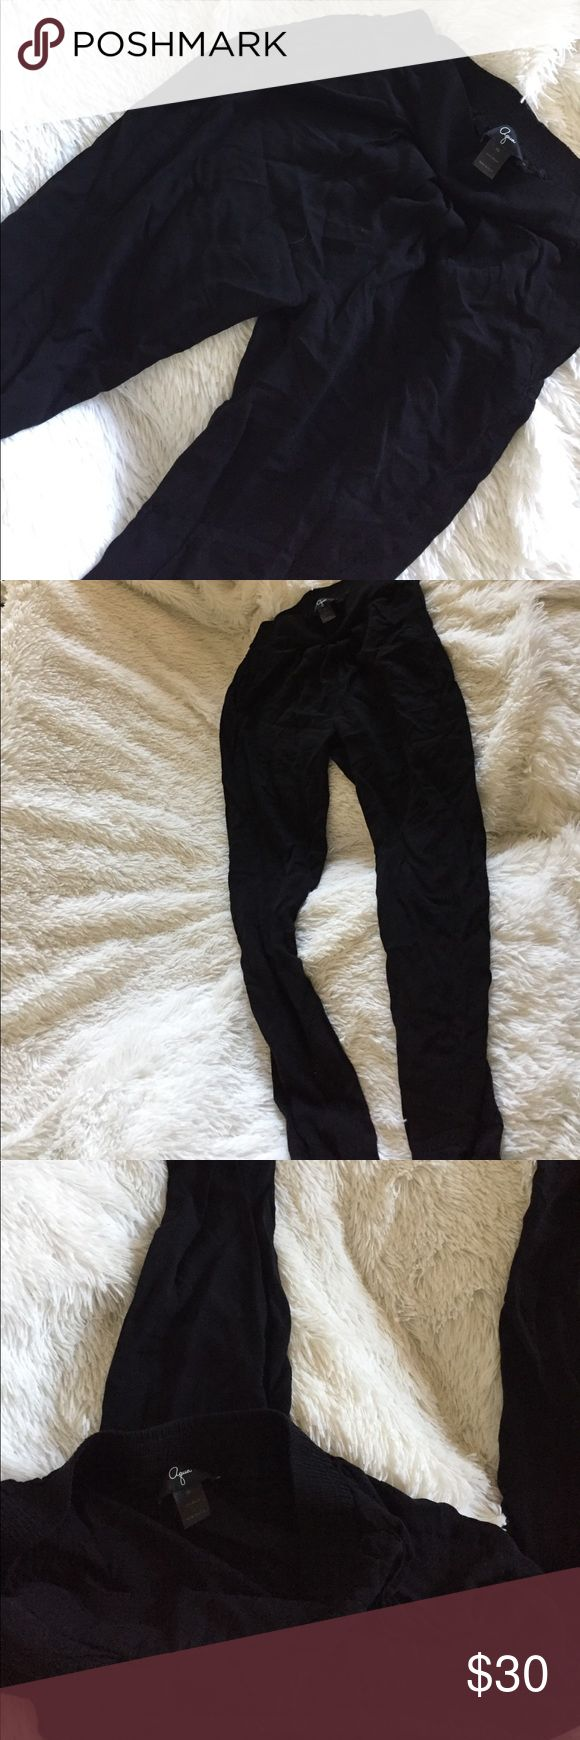 Aqua pants So cute and comfy like new Aqua Pants